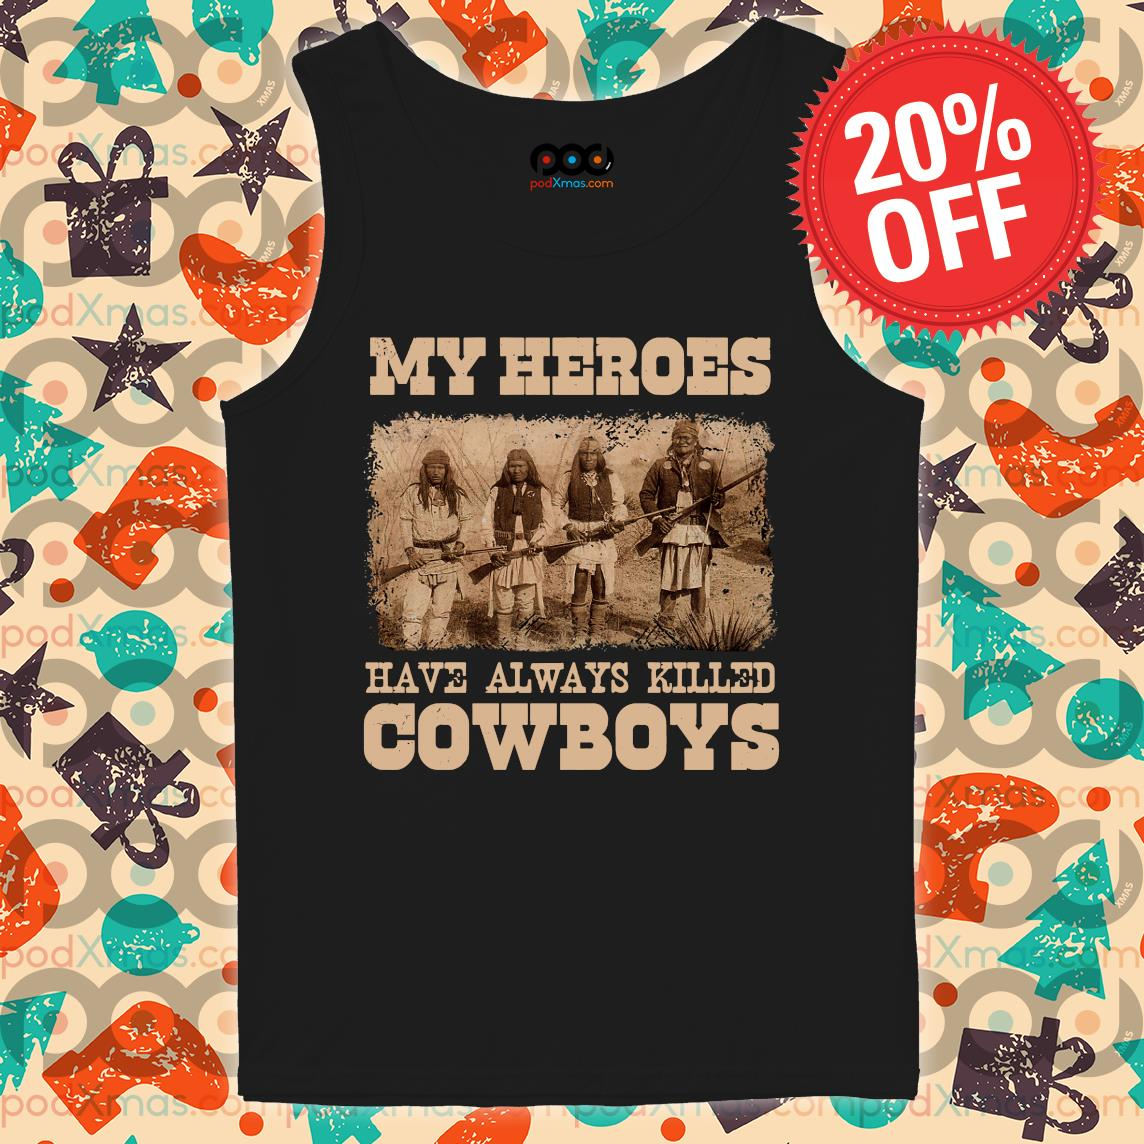 Native My heroes have always killed cowboys s Tank top PODxmas den